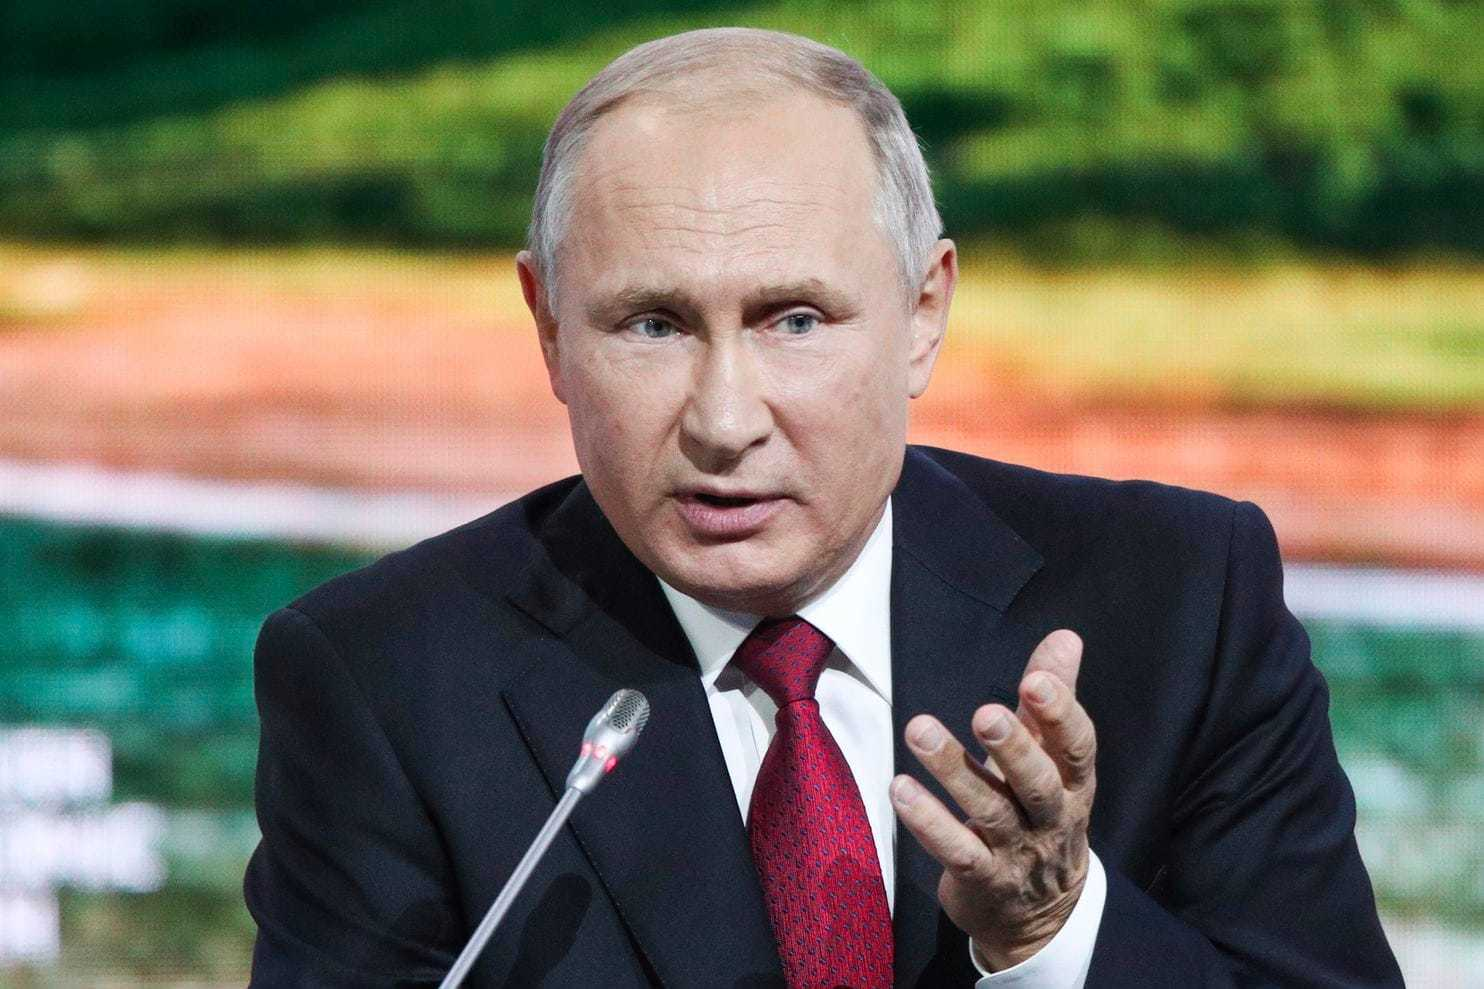 Nga,hiến pháp,Putin,Tổng thống Putin,Tổng thống Nga